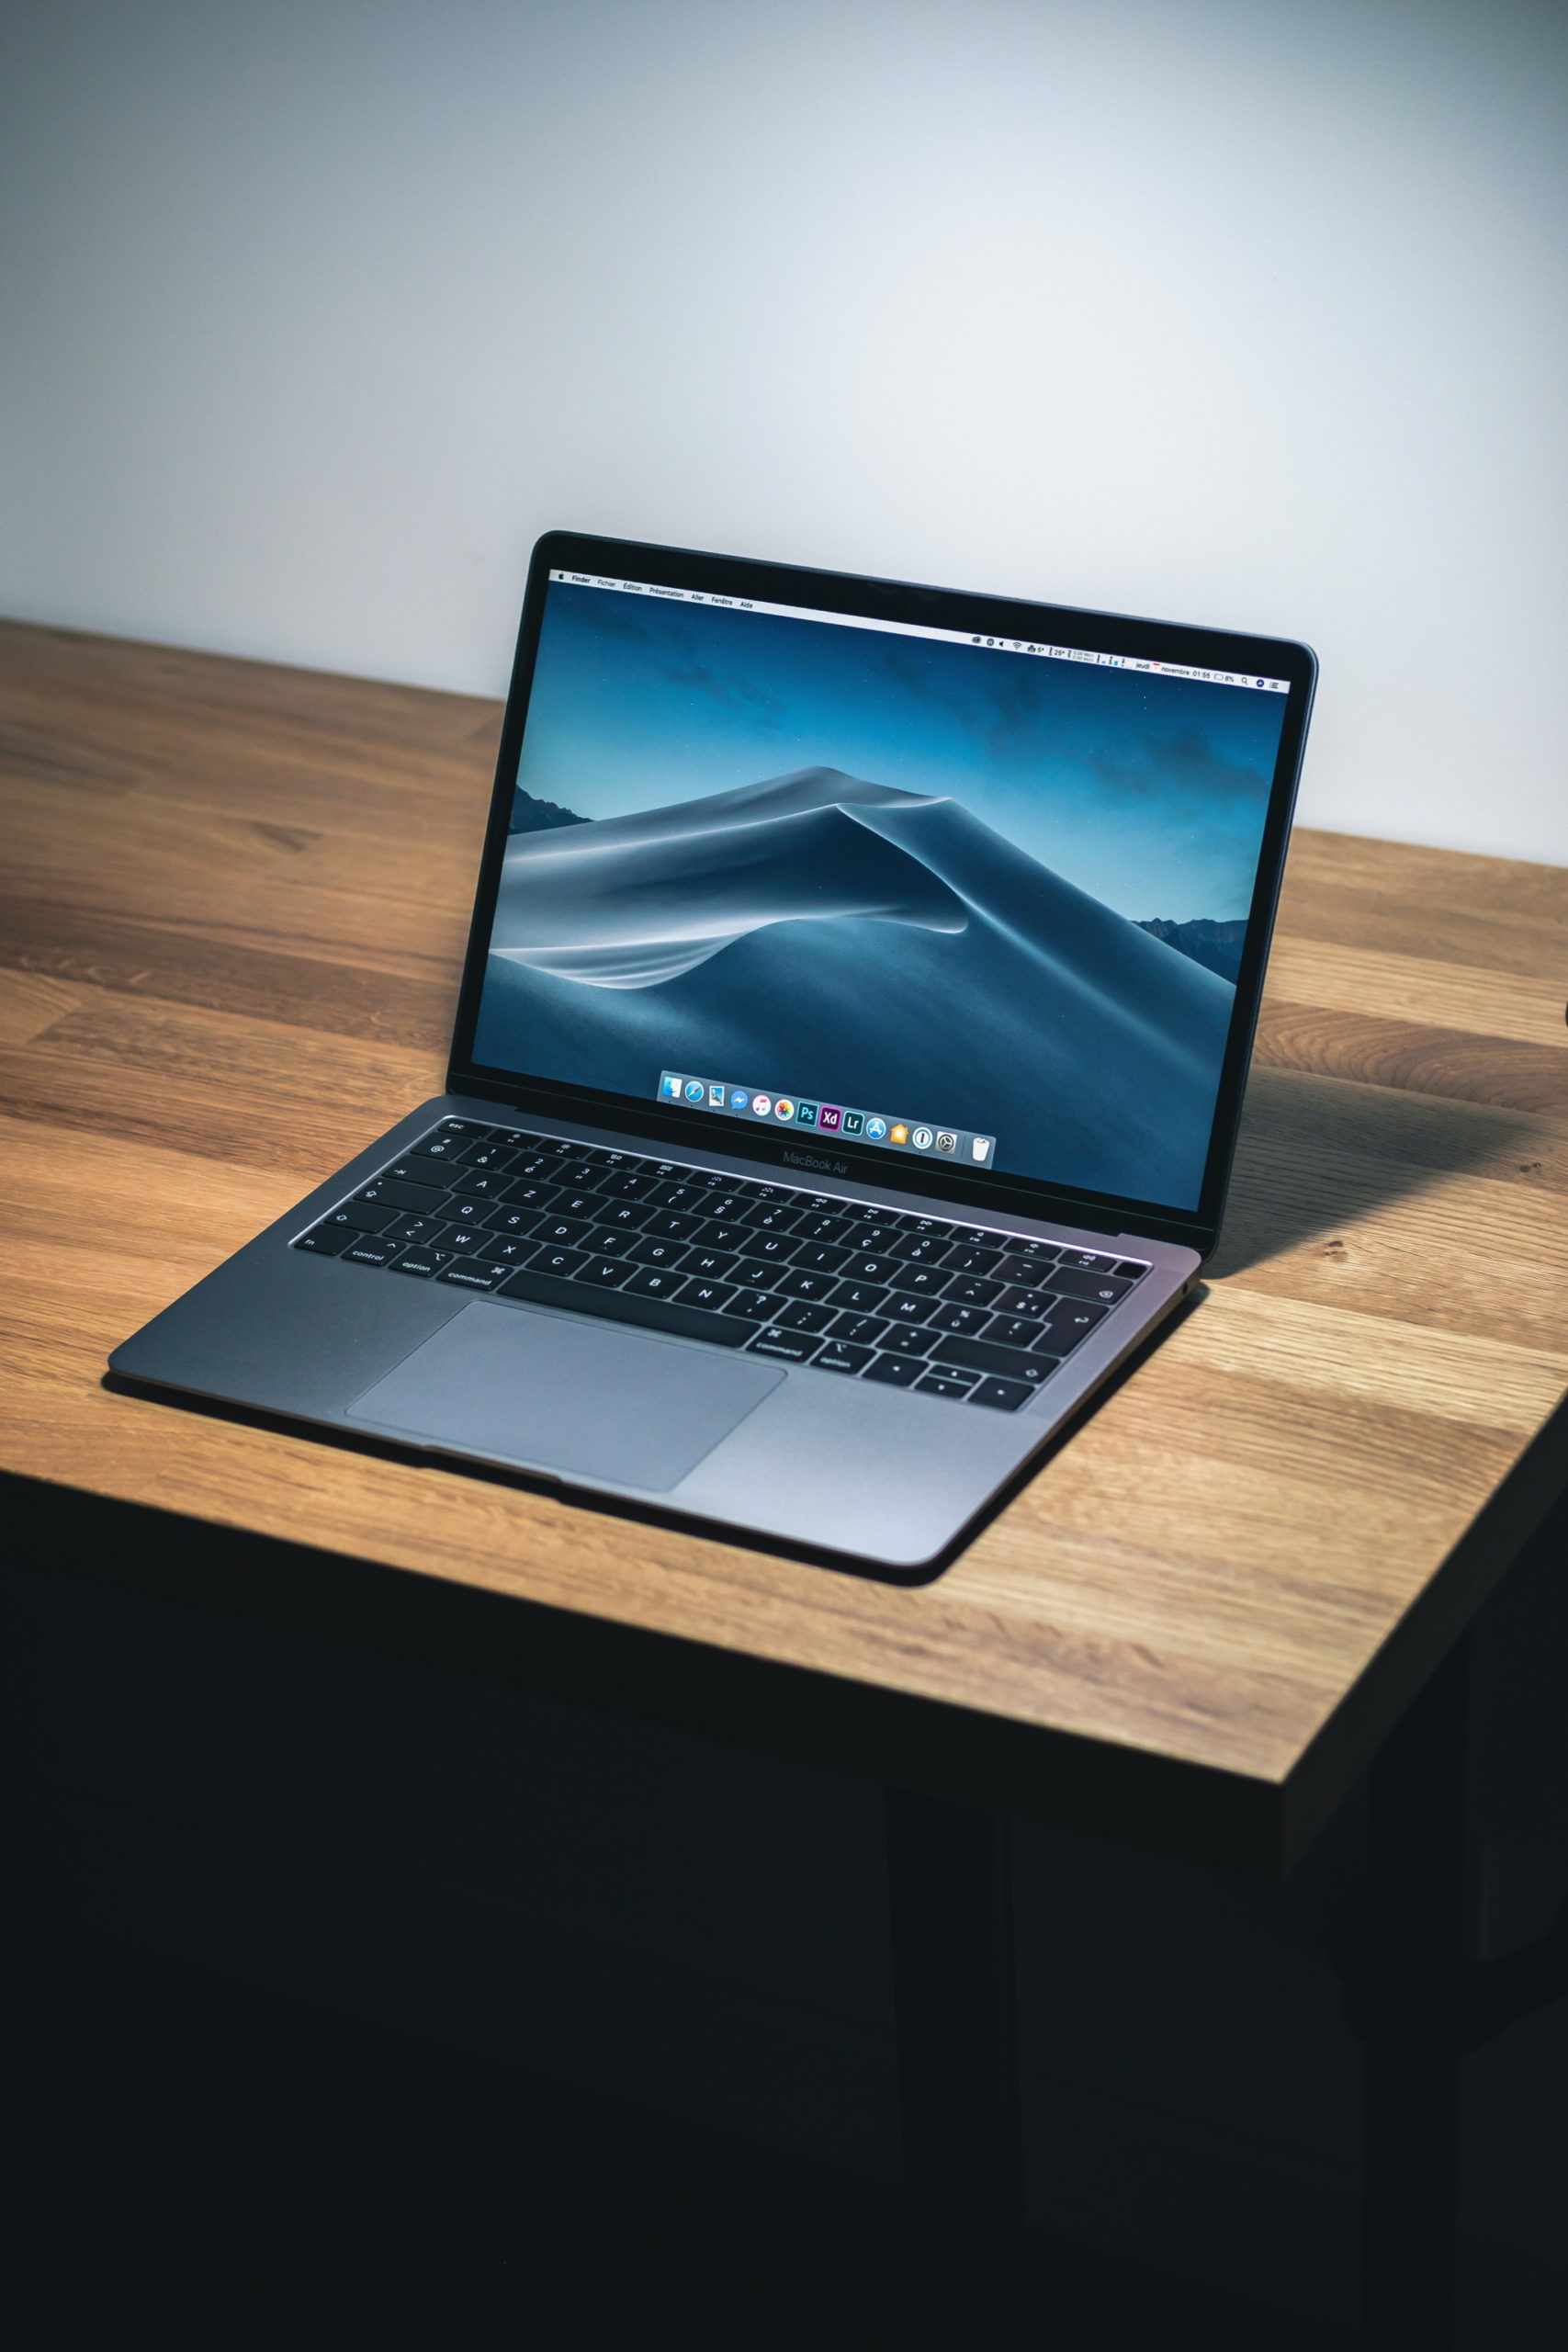 mac laptop computer notebook howard-bouchevereau-RSCirJ70NDM-unsplash